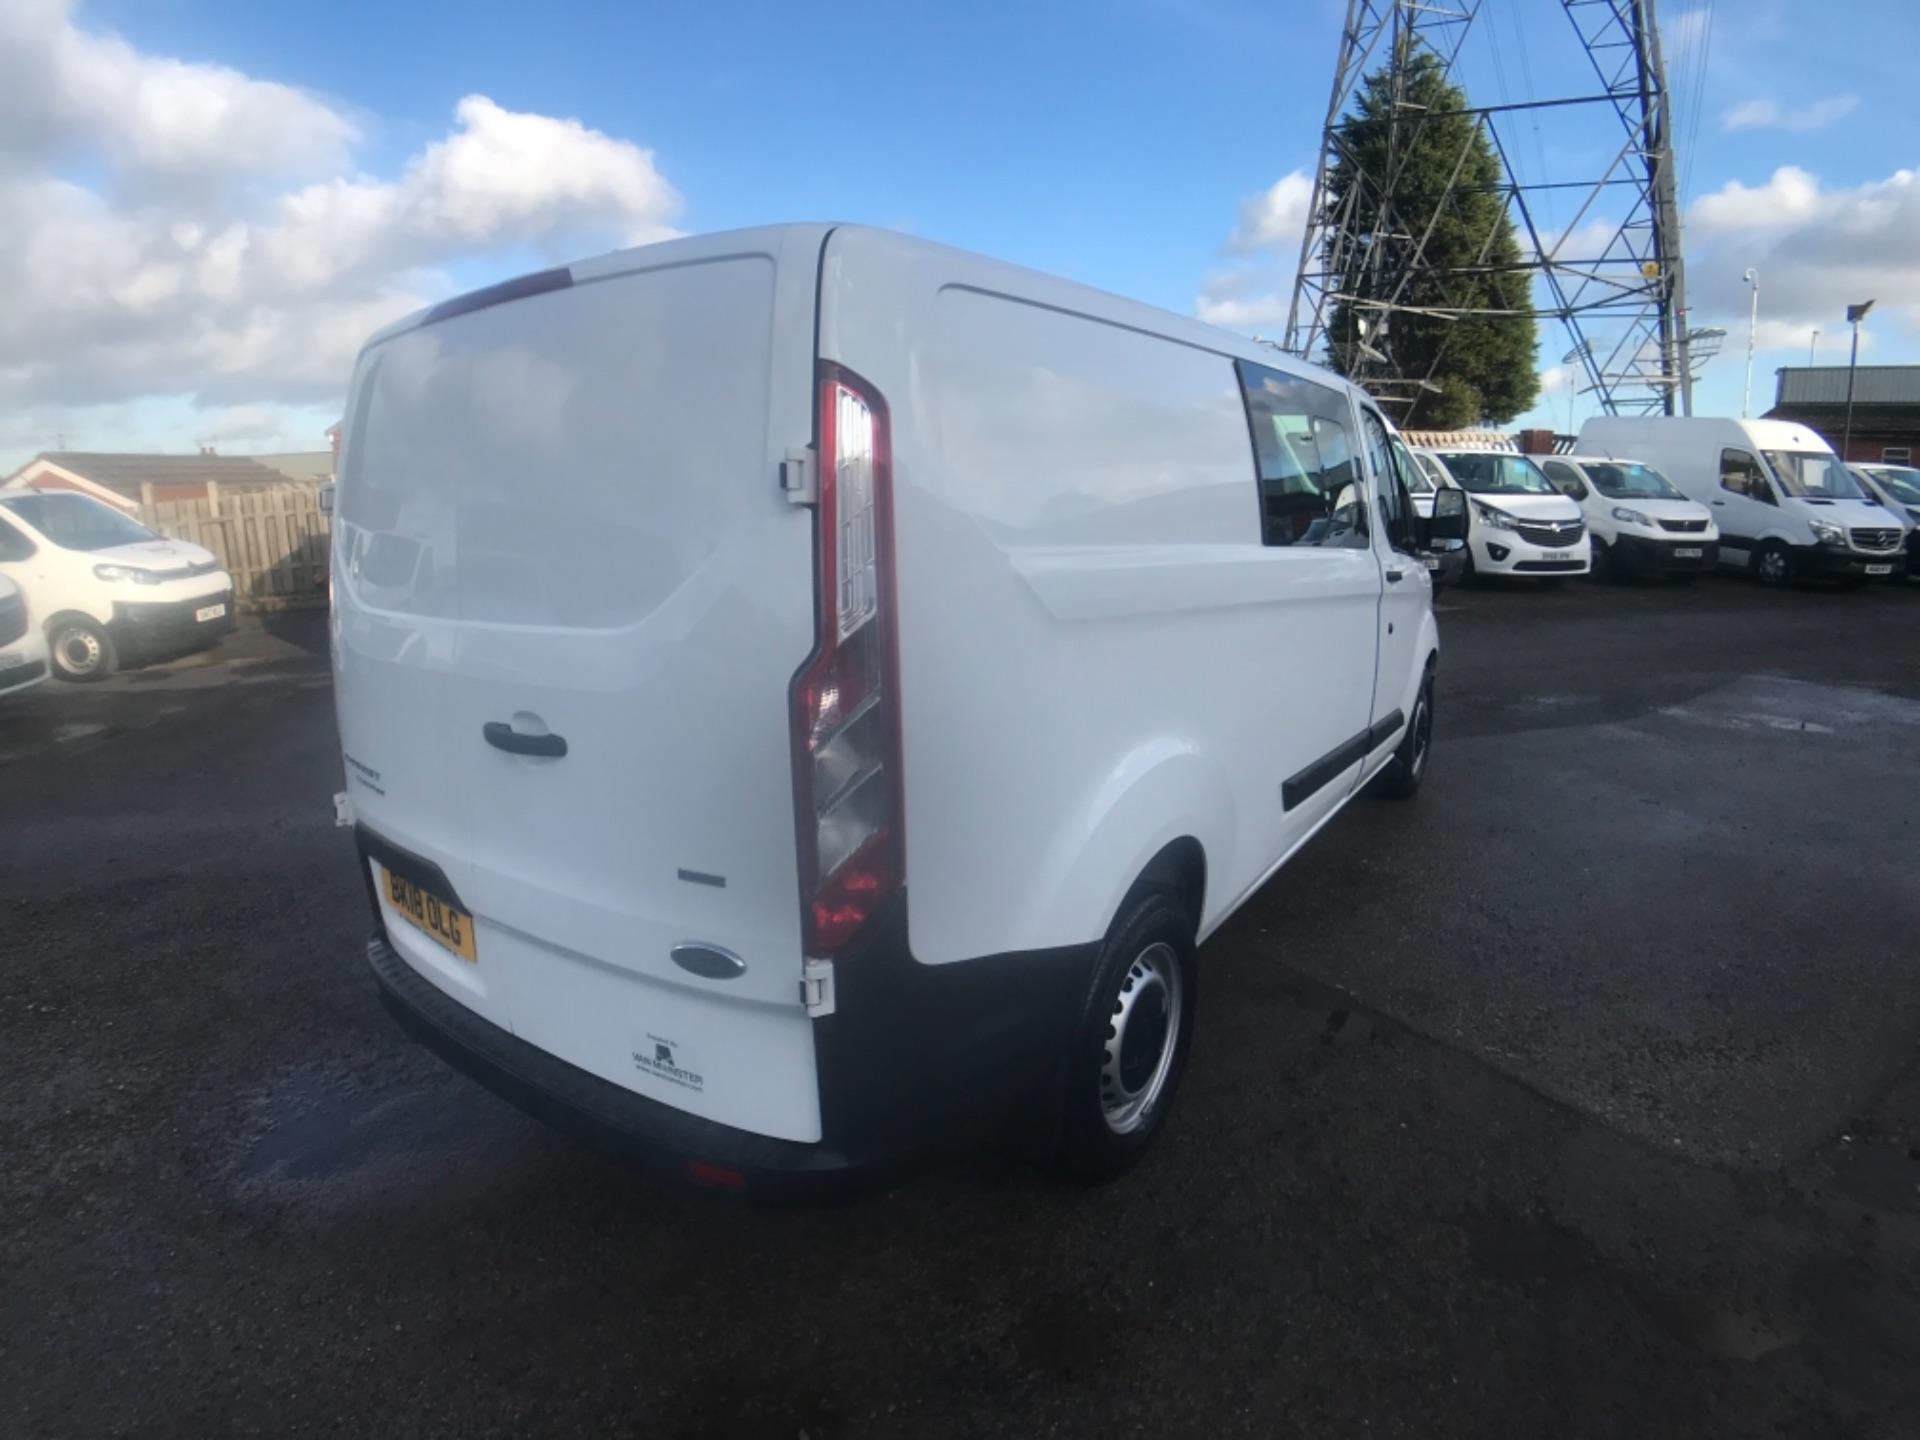 2018 Ford Transit Custom 320 L2 2.0 130ps D/Cab Euro 6 (BK18OLG) Image 7